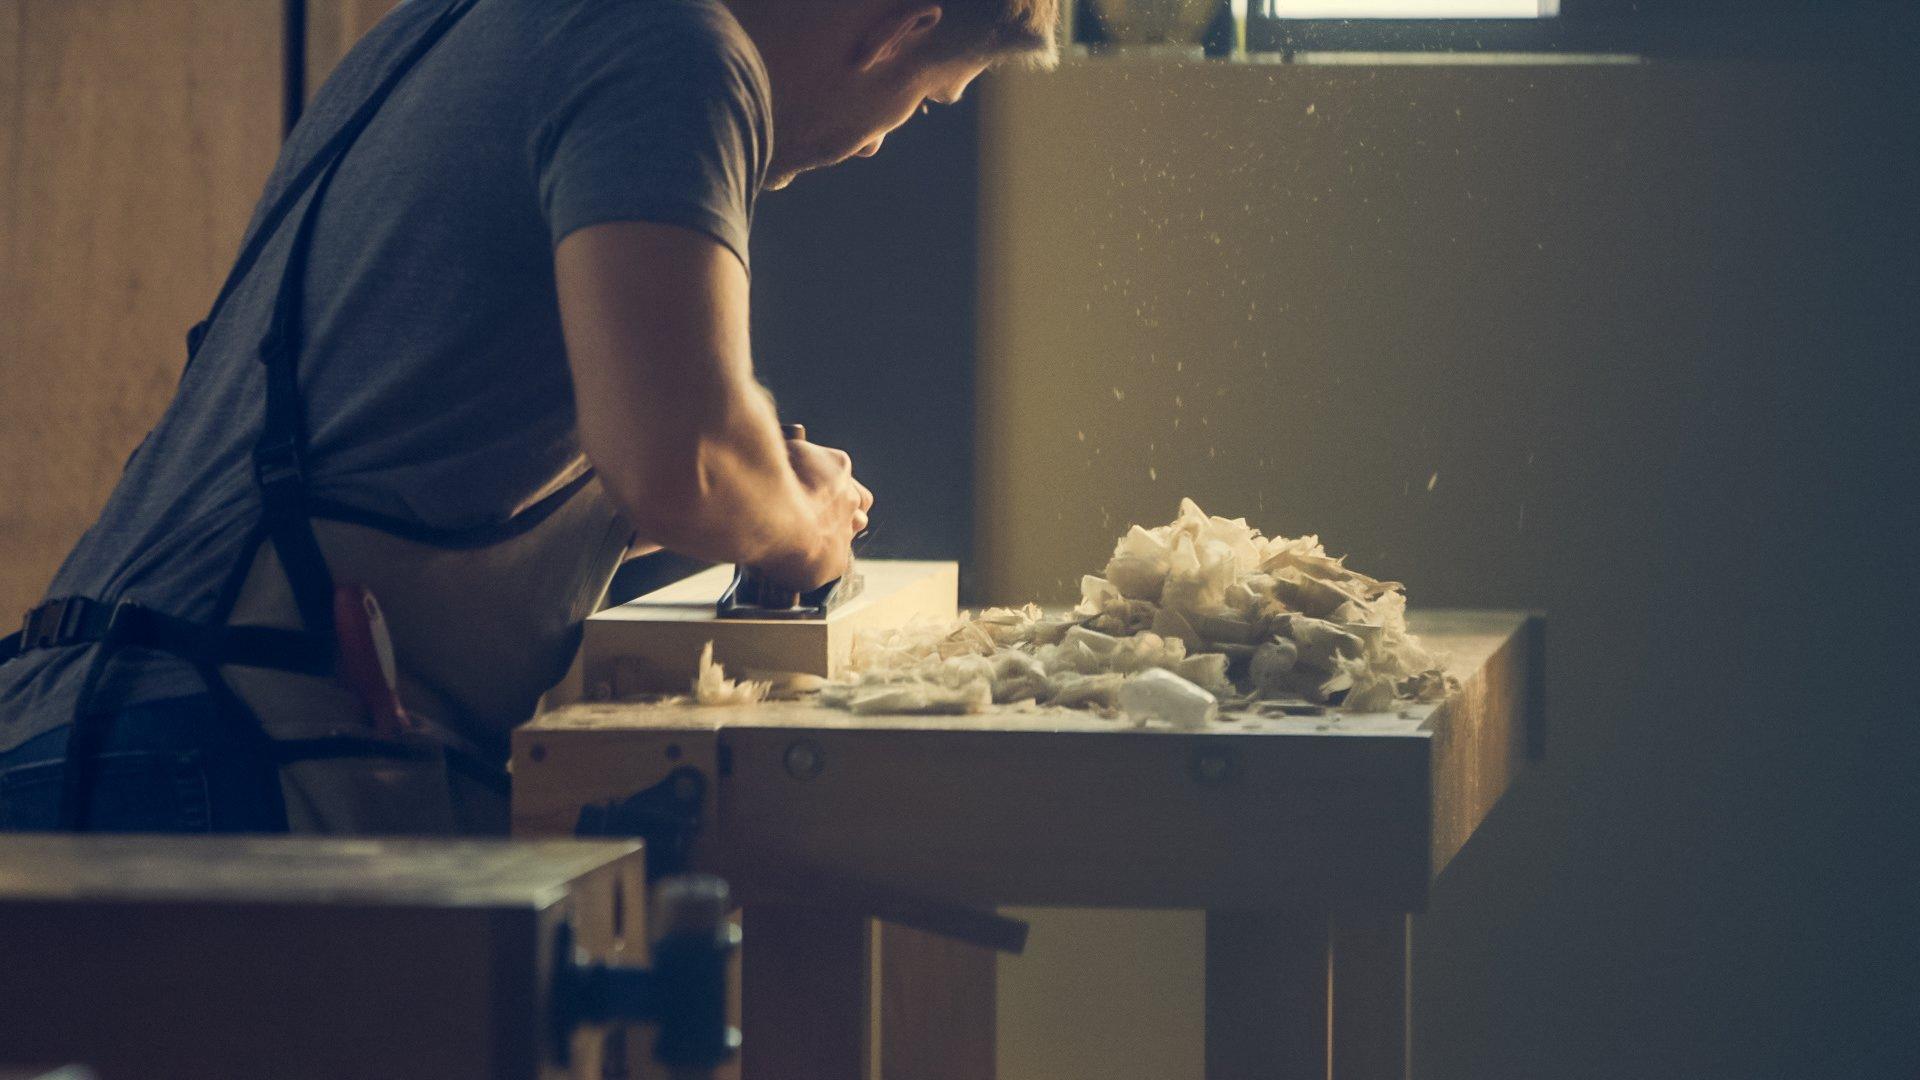 bournel-gaetan-menuiserie-travail-sur-mesure